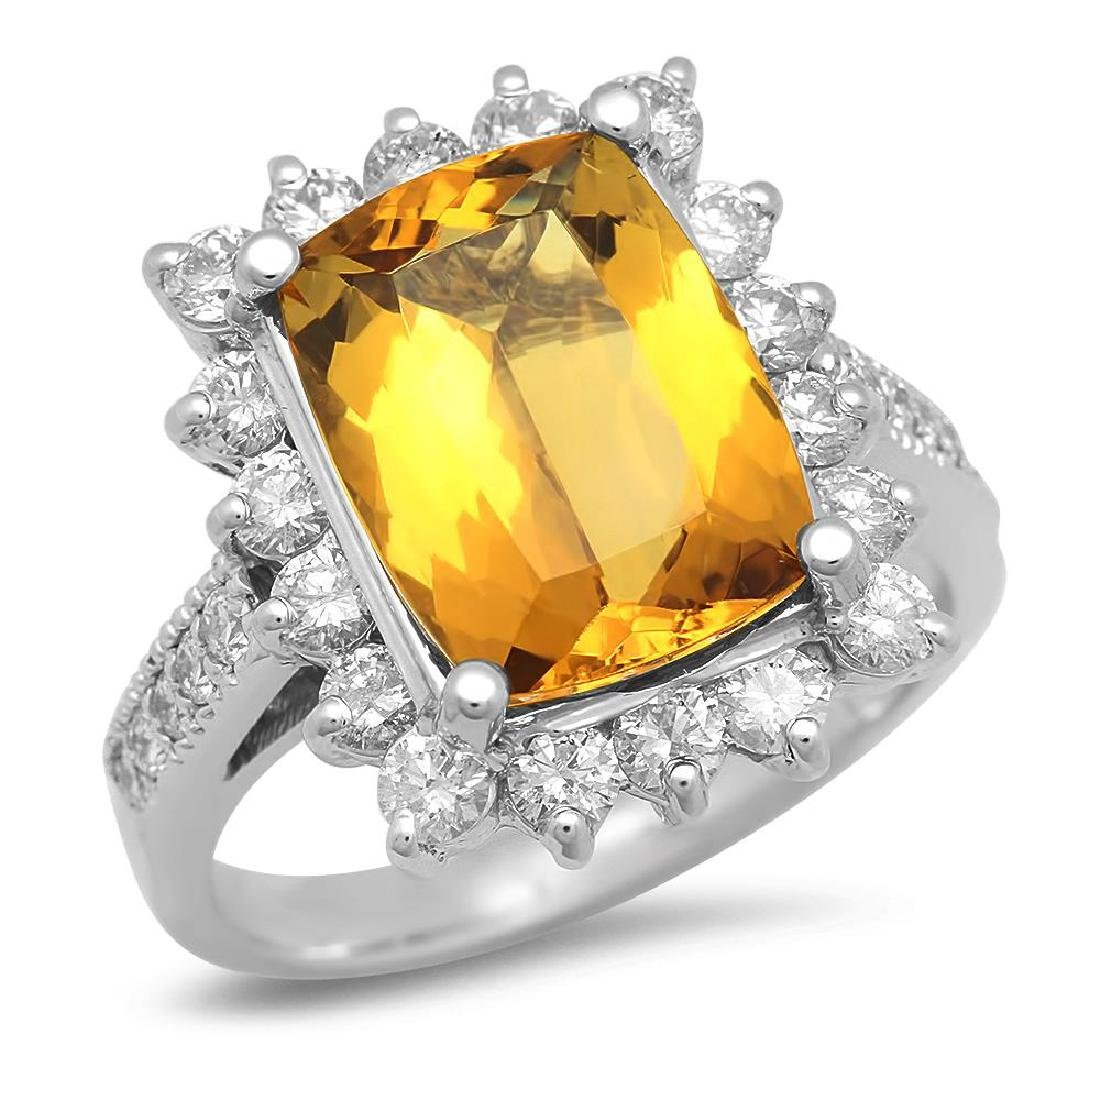 14K Gold 3.91ct Yellow Beryl 1.15cts Diamond Ring